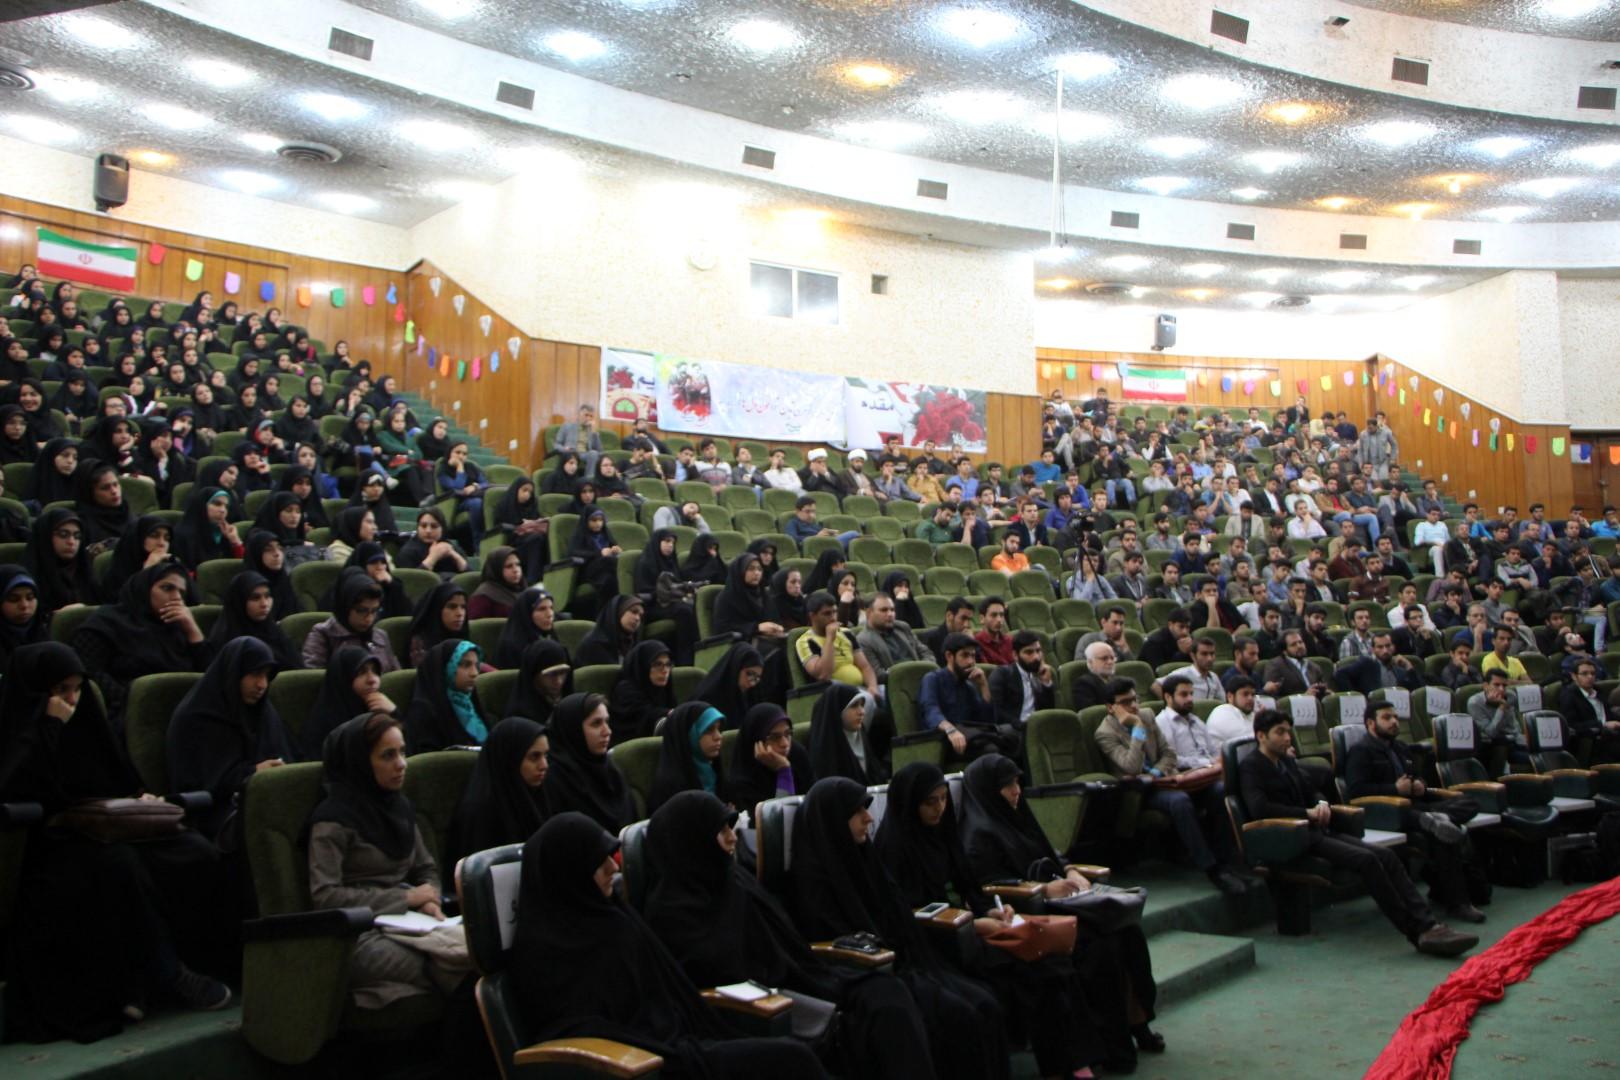 IMG 5218 گزارش تصویری؛ سخنرانی استاد حسن عباسی با موضوع از چوئن لای تا سیاست درهای باز